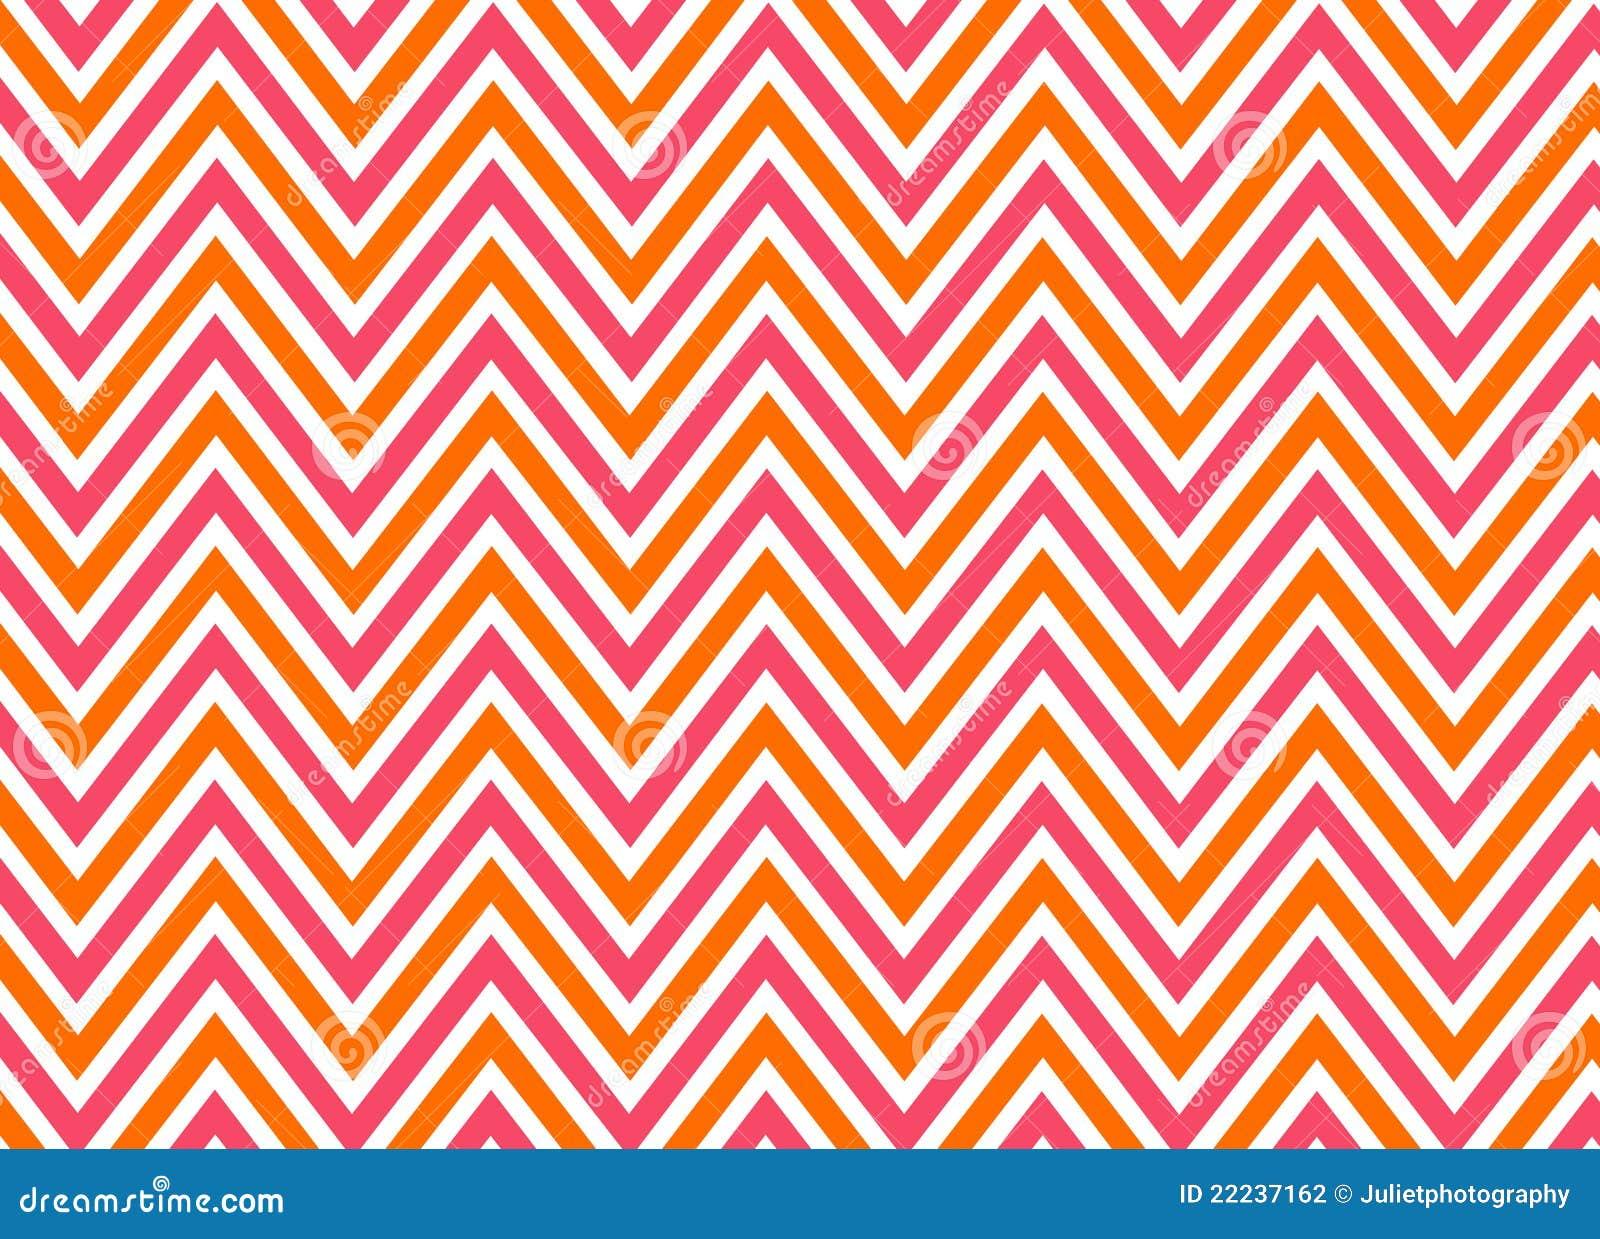 Bright chevron red, orange and white pattern